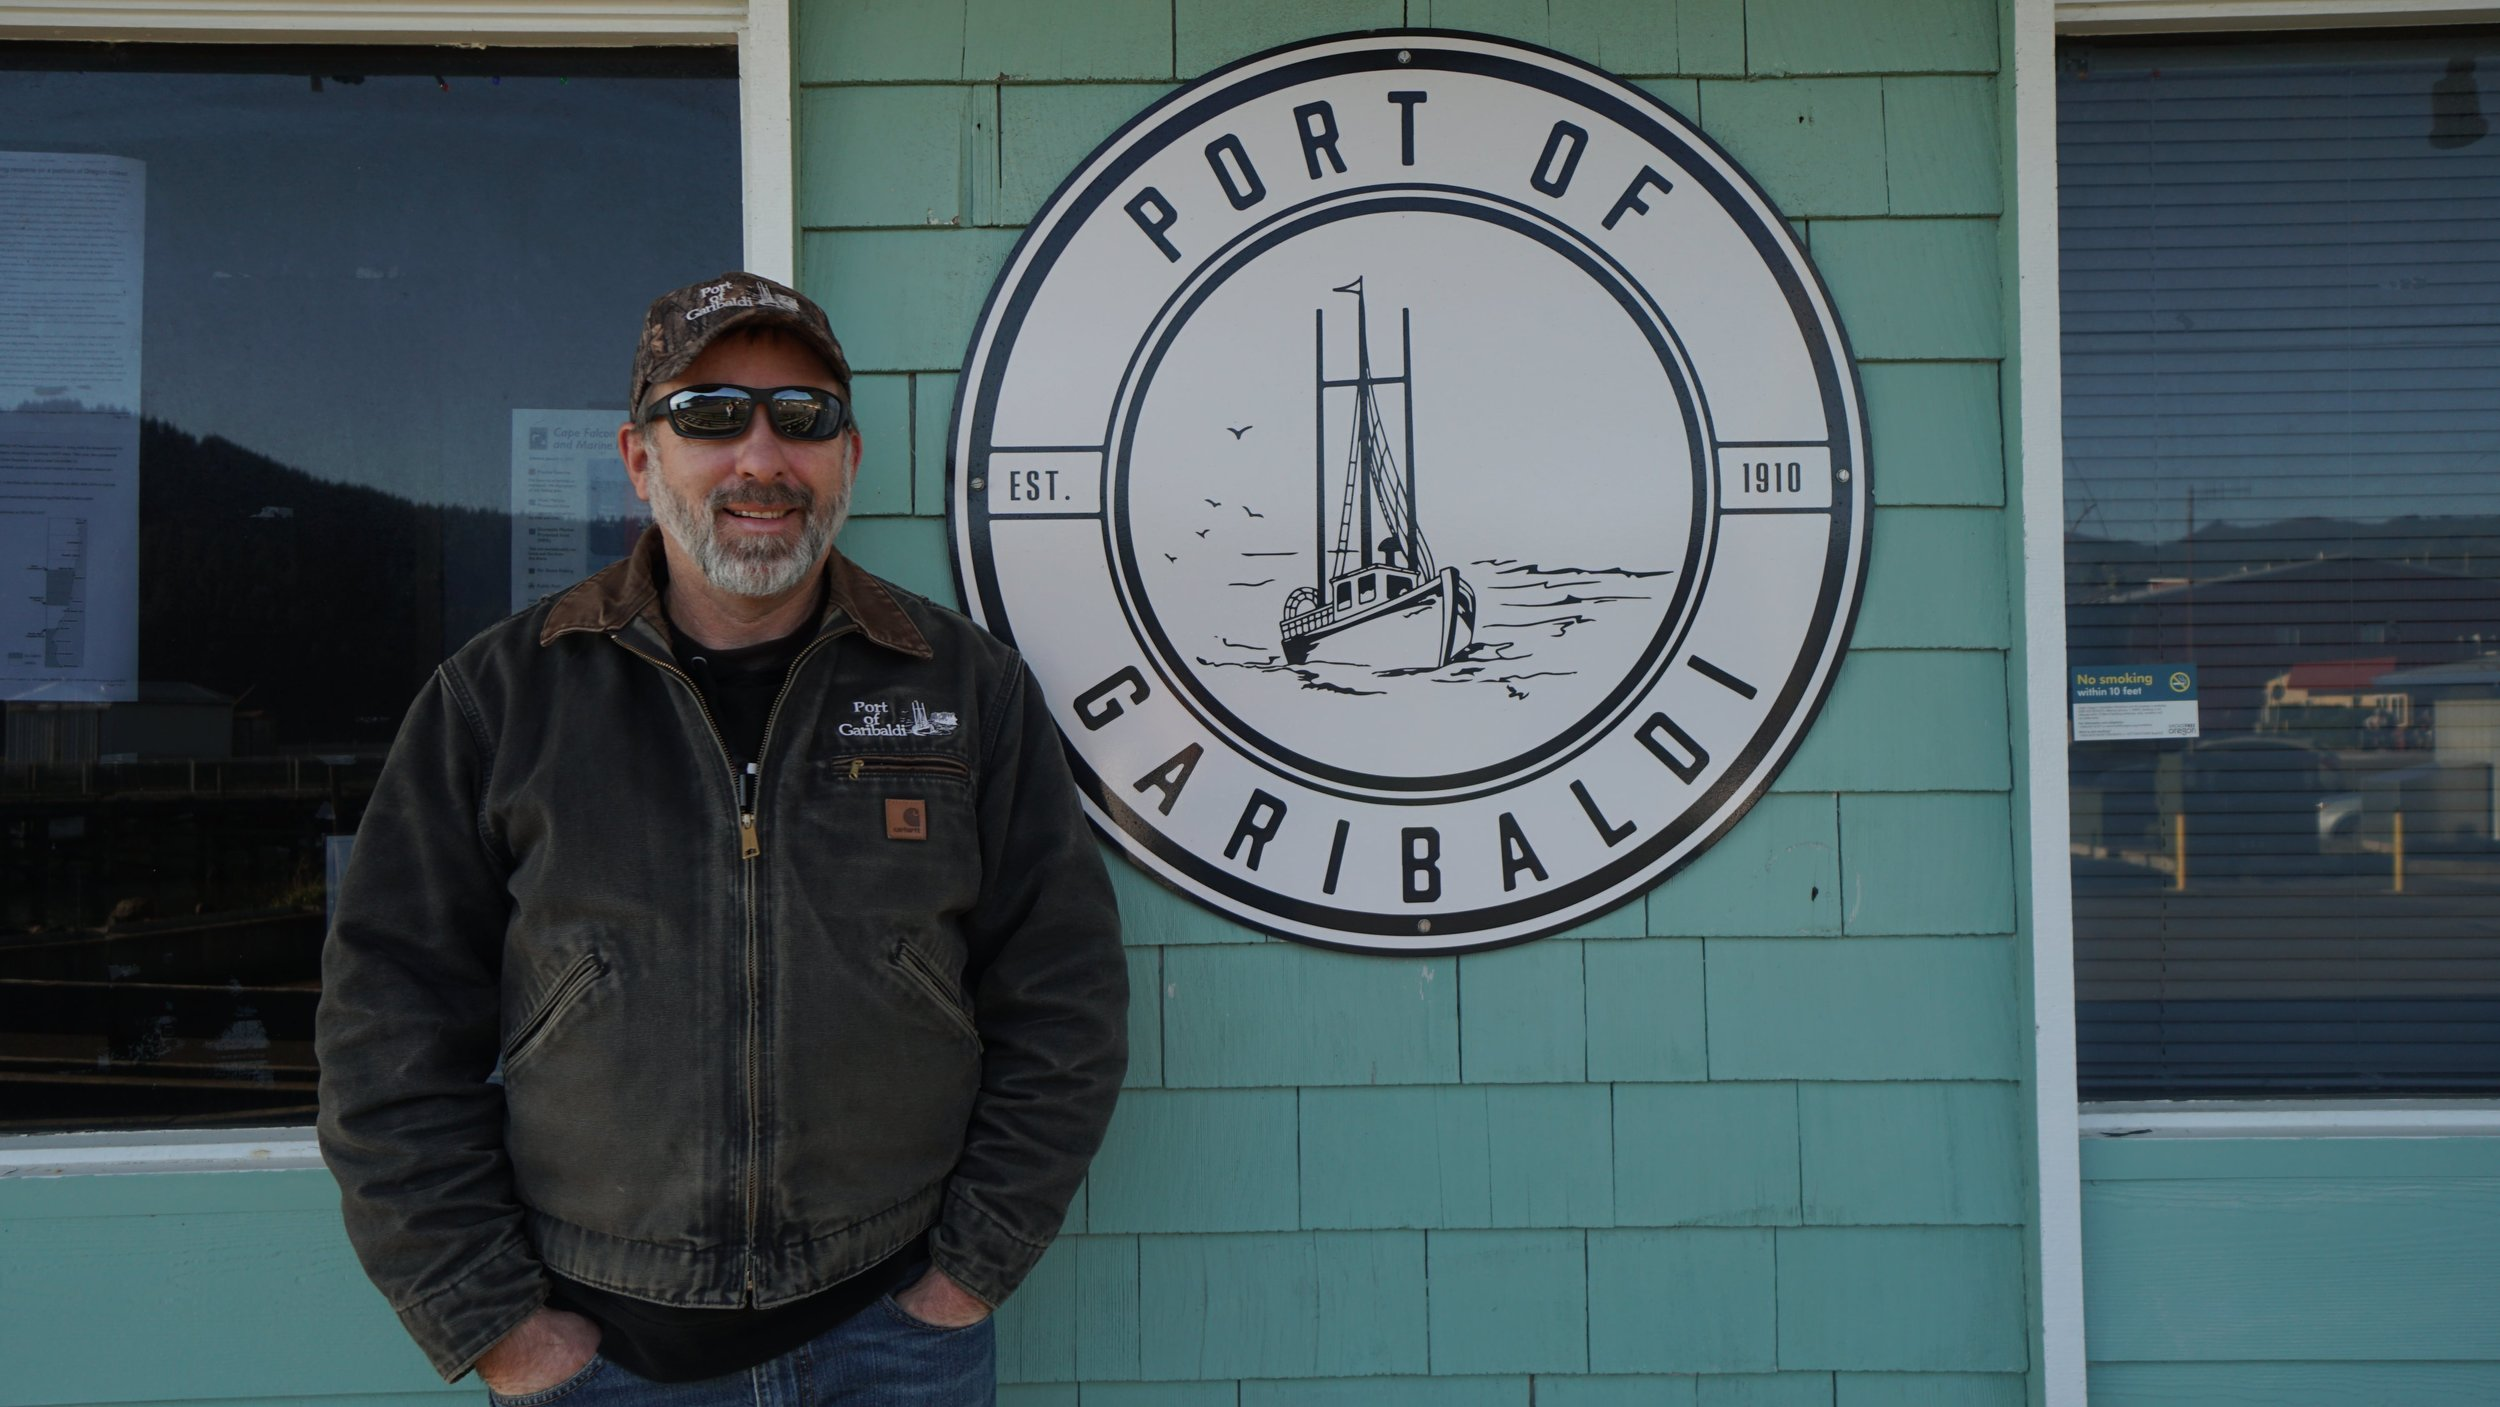 Michael Saindon,Manager of the Port of Garibaldi